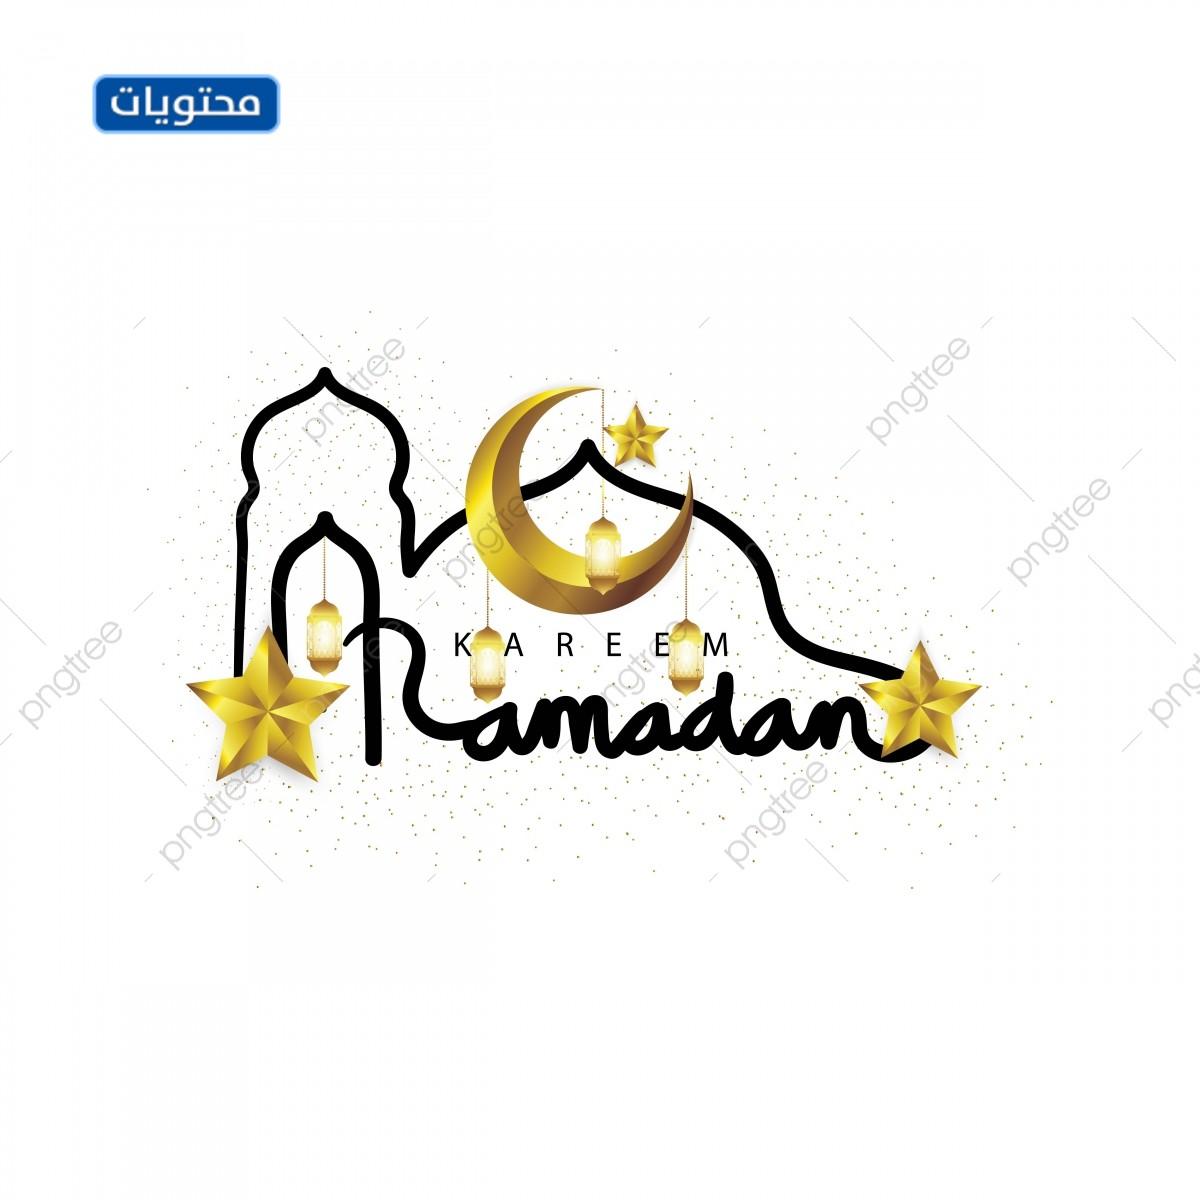 كيف اكتب رمضان كريم بالانجليزي